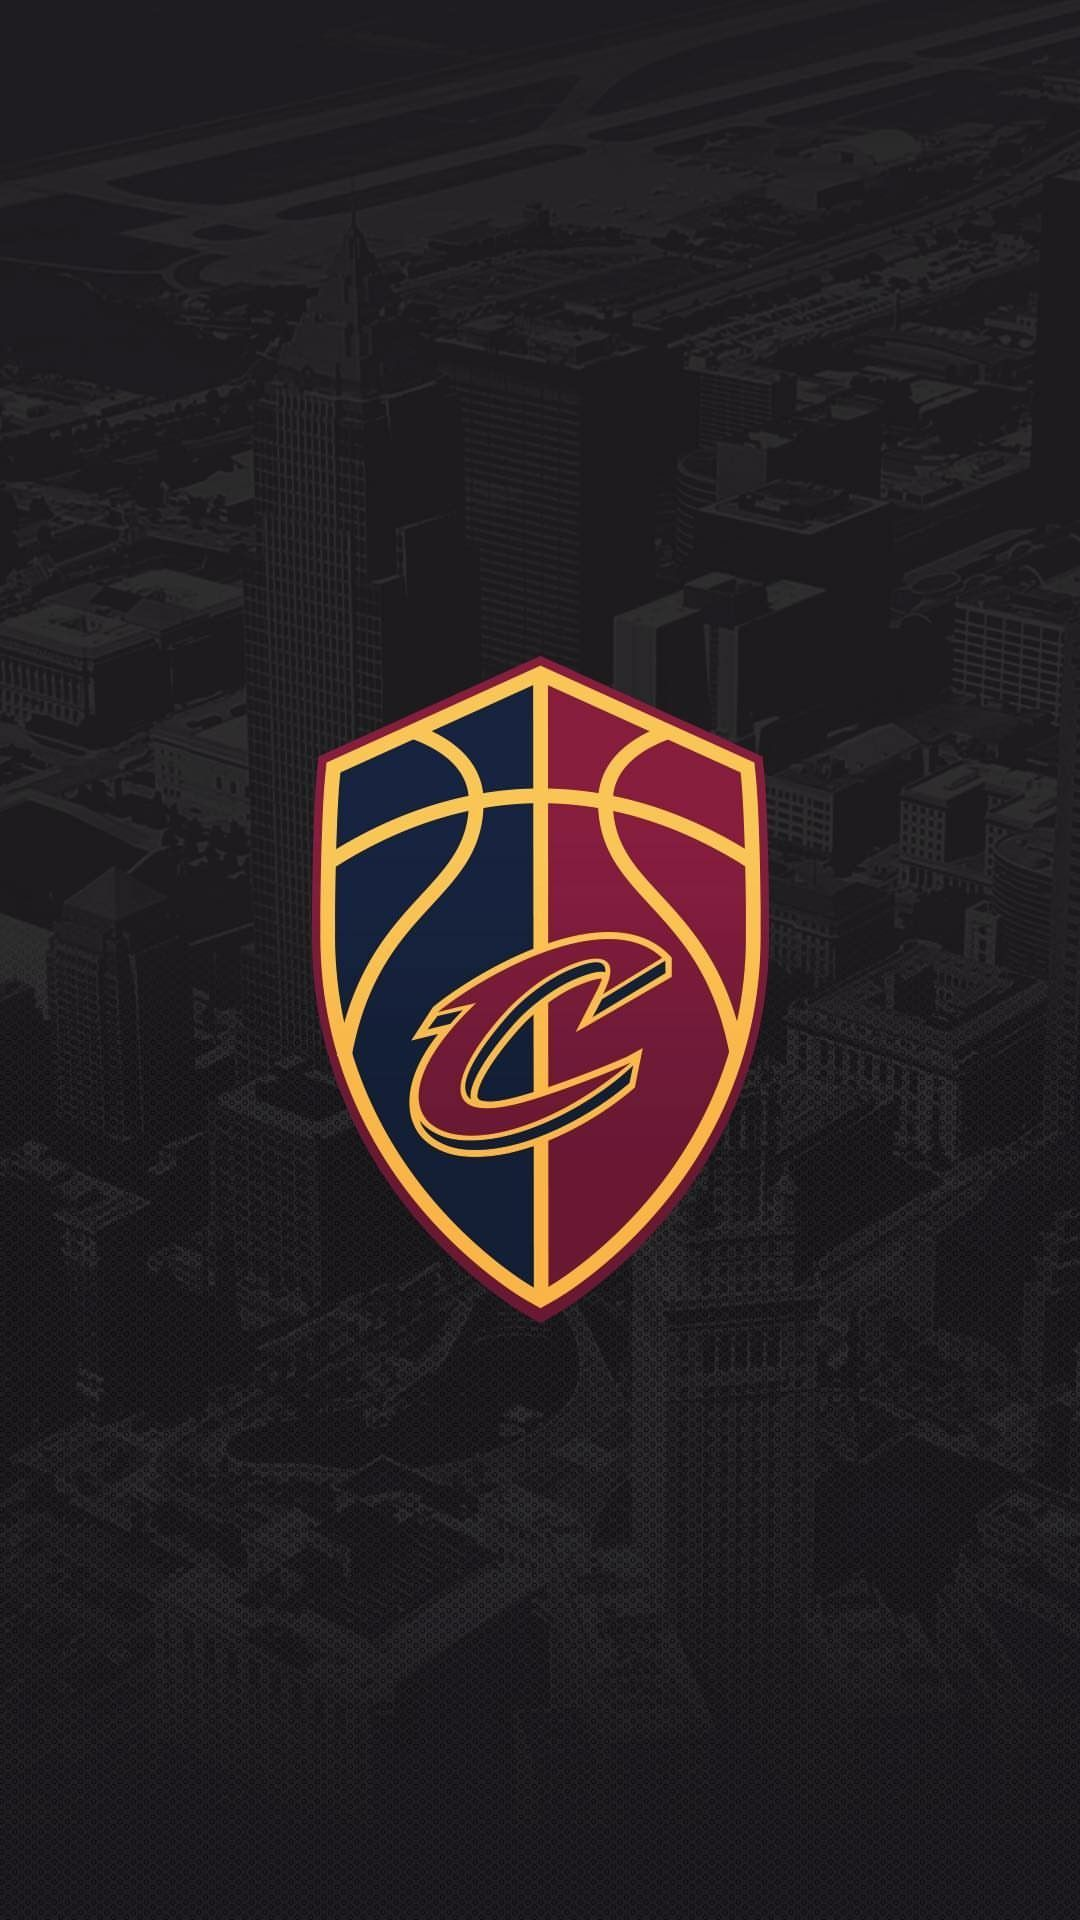 Cleveland Cavaliers Wallpaper Cavs Wallpaper Cavaliers Wallpaper Nba Wallpapers